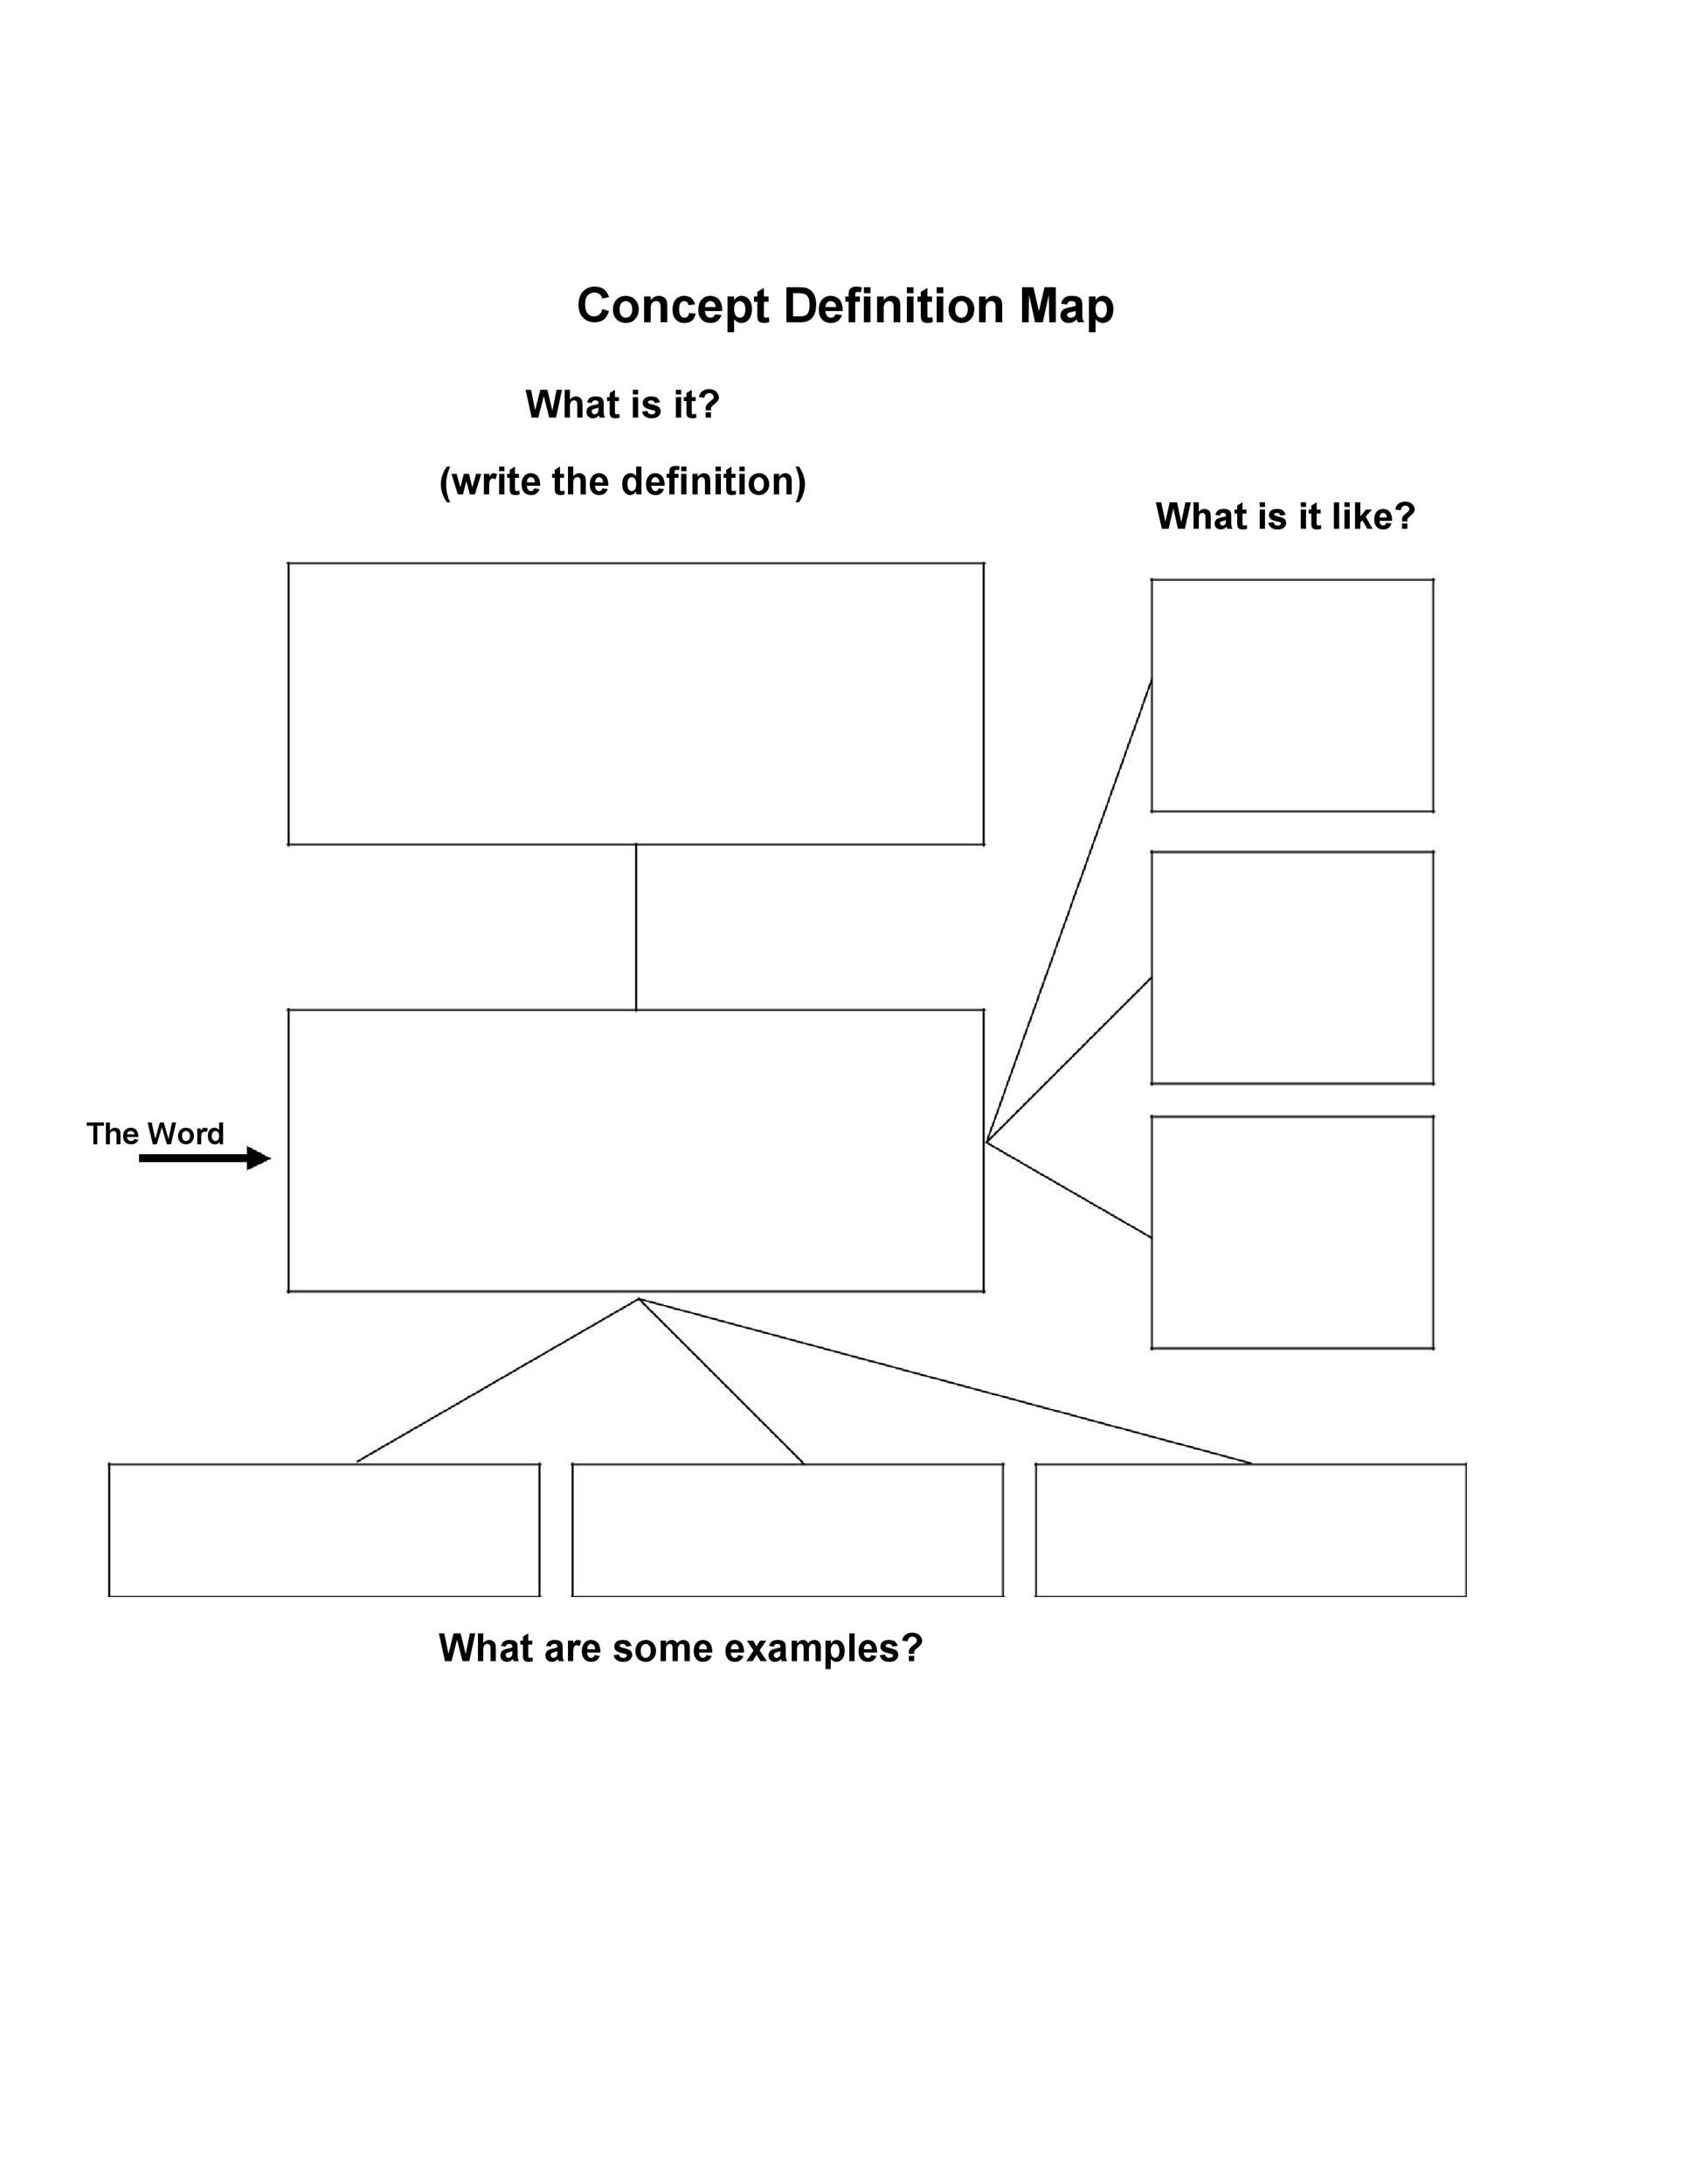 40+ Concept Map Templates Hierarchical, Spider, Flowchart - concept map template